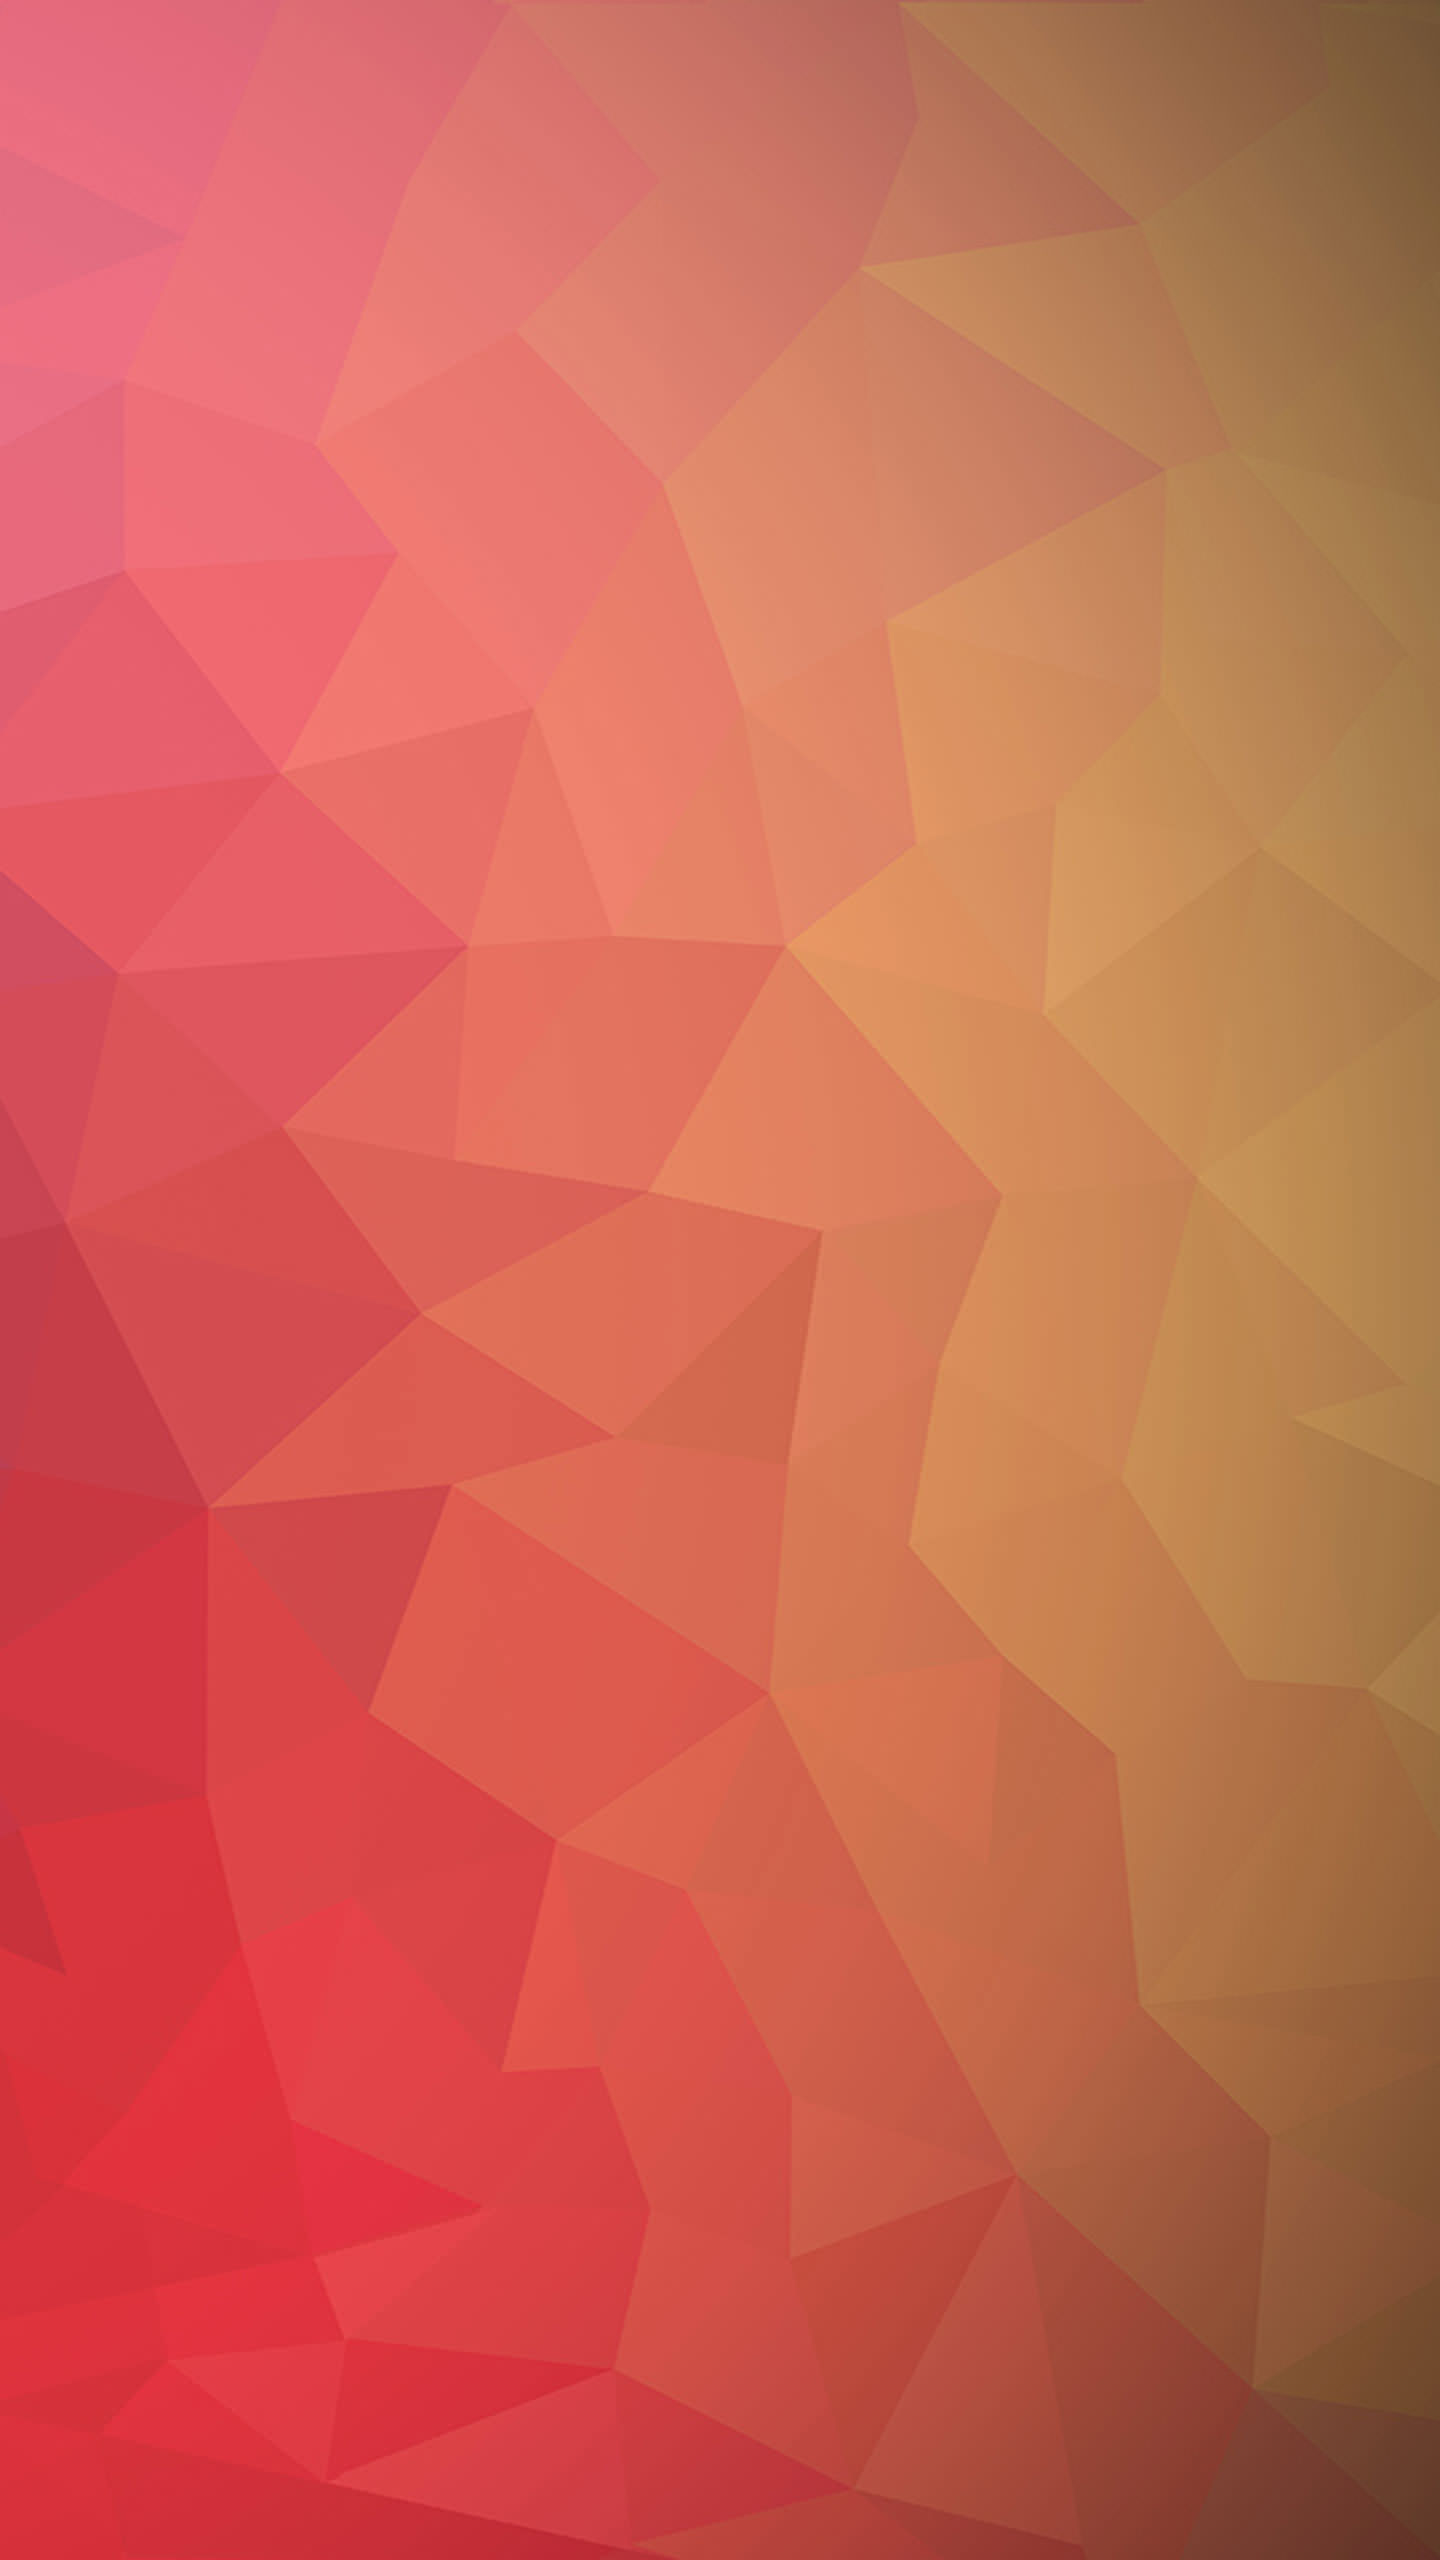 pattern red peach orange wallpaper sc smartphone